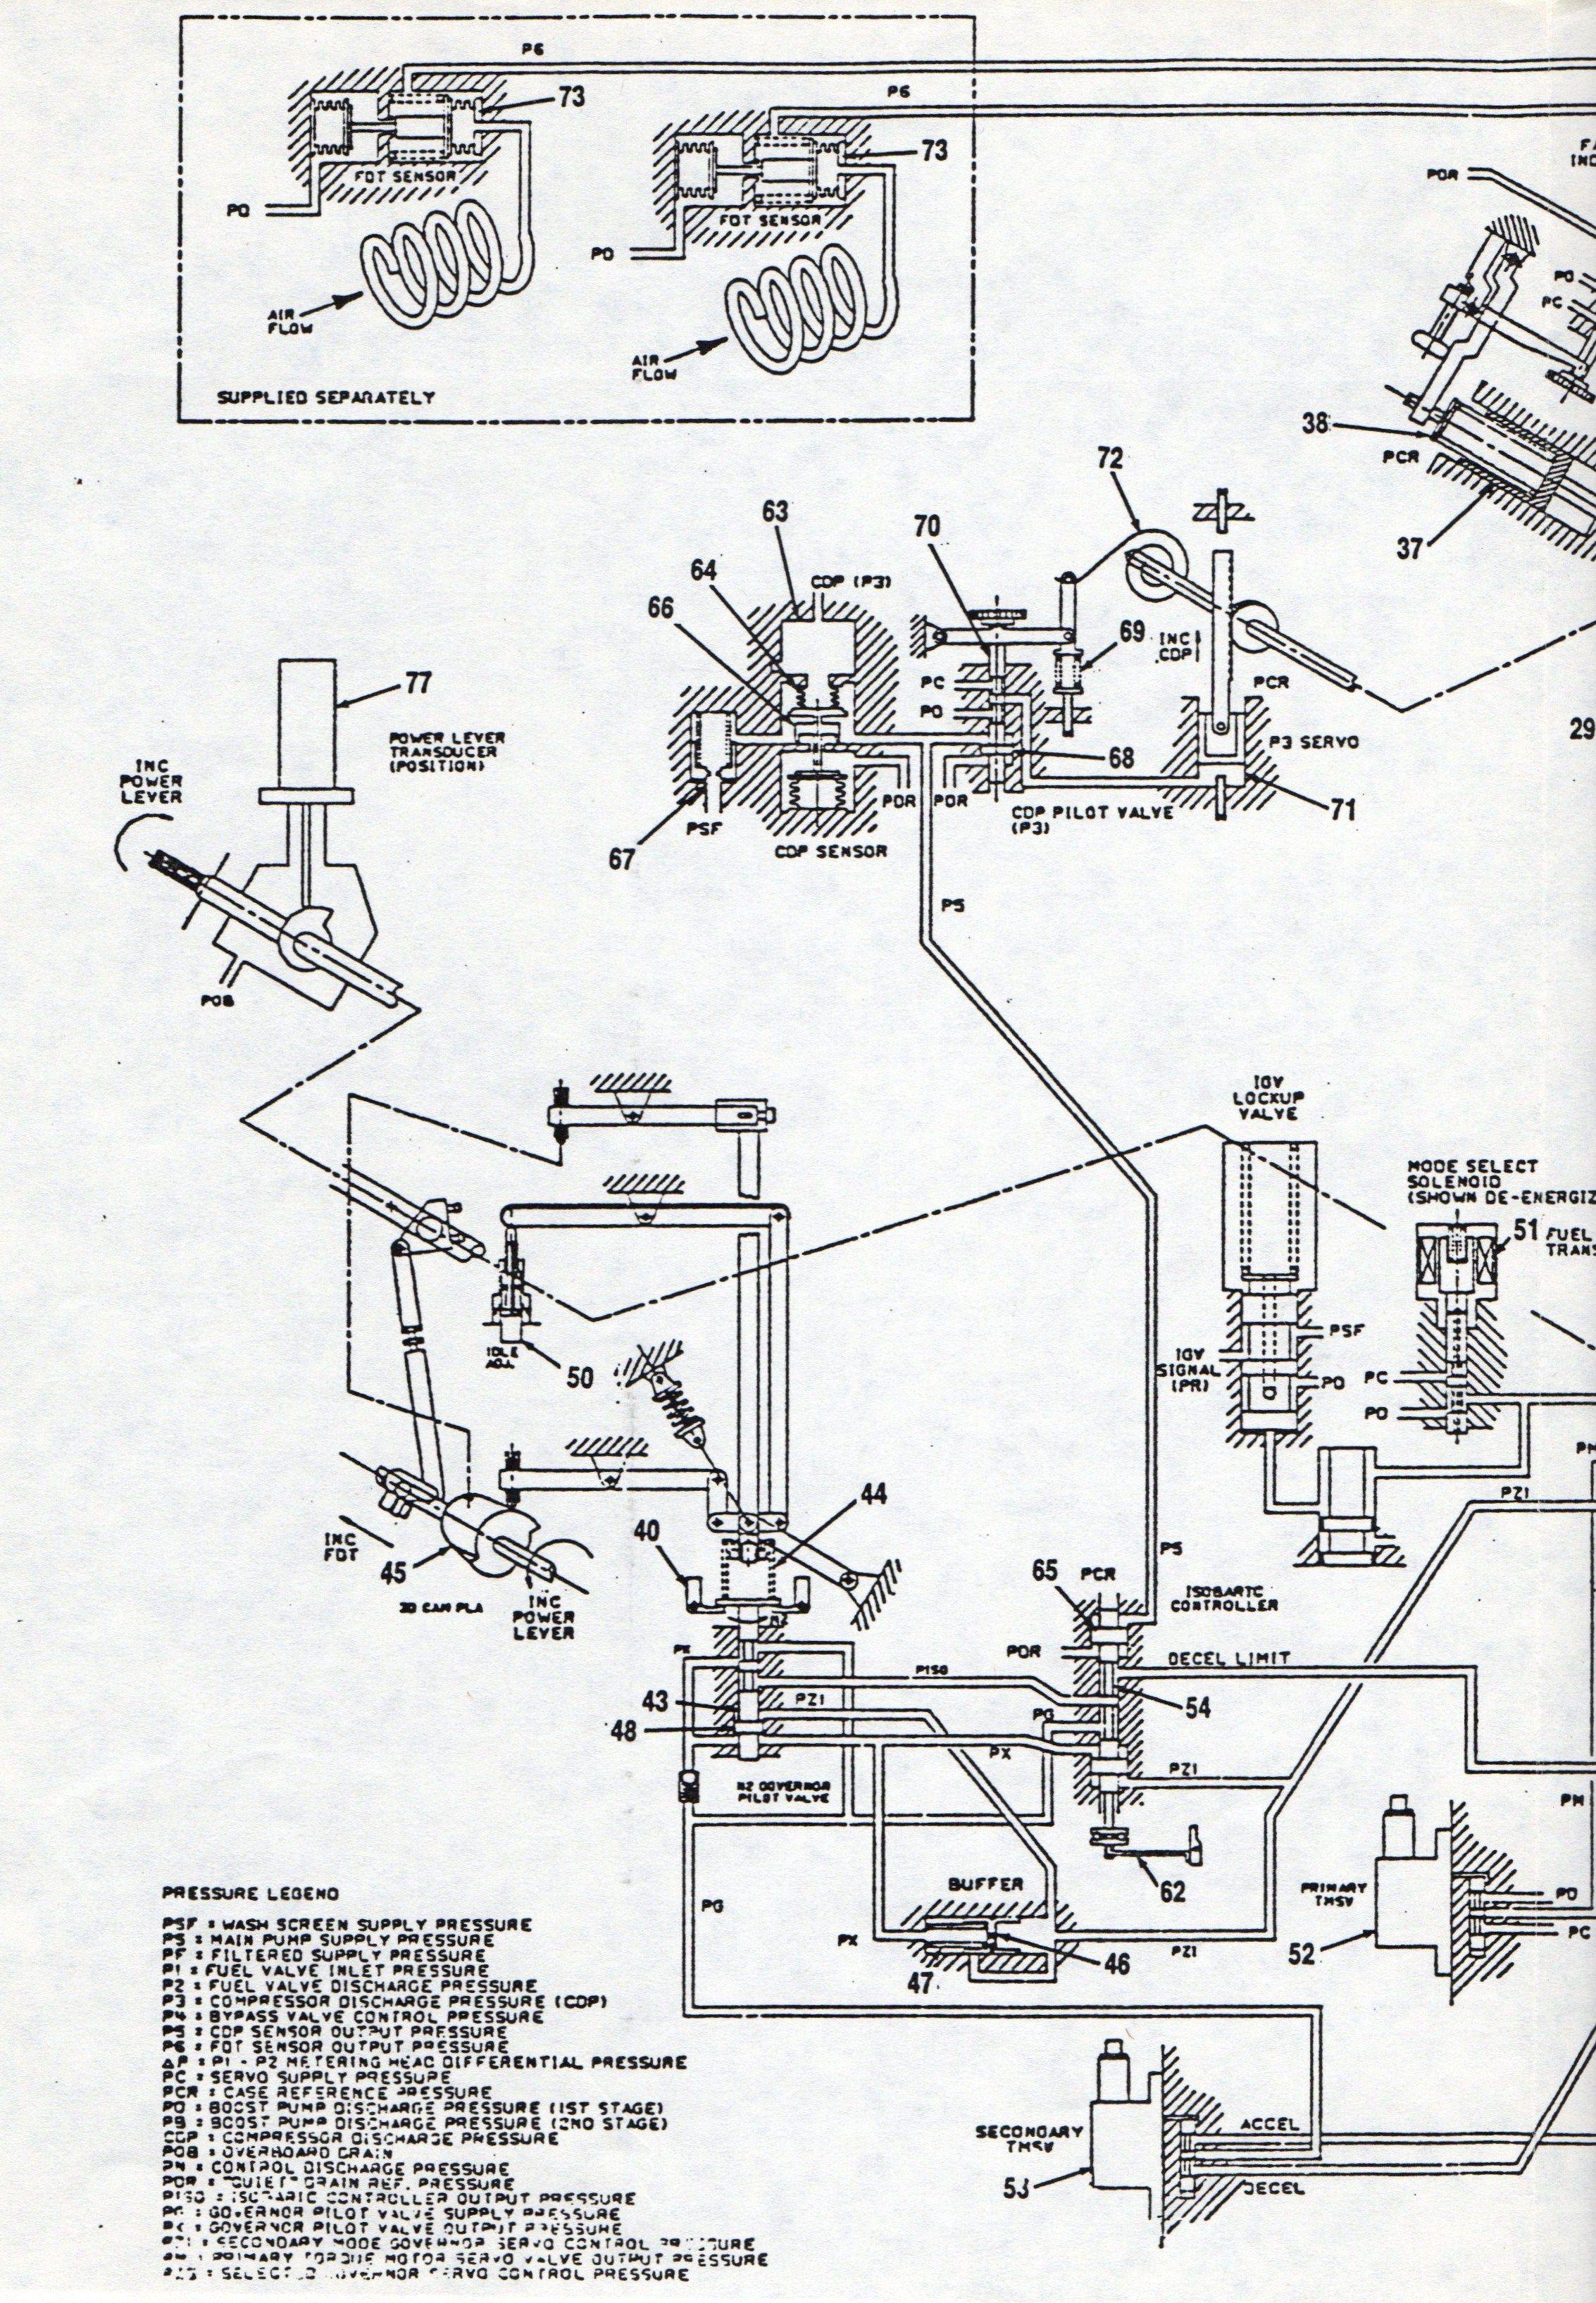 medium resolution of page 31 wgc f110 main engine control